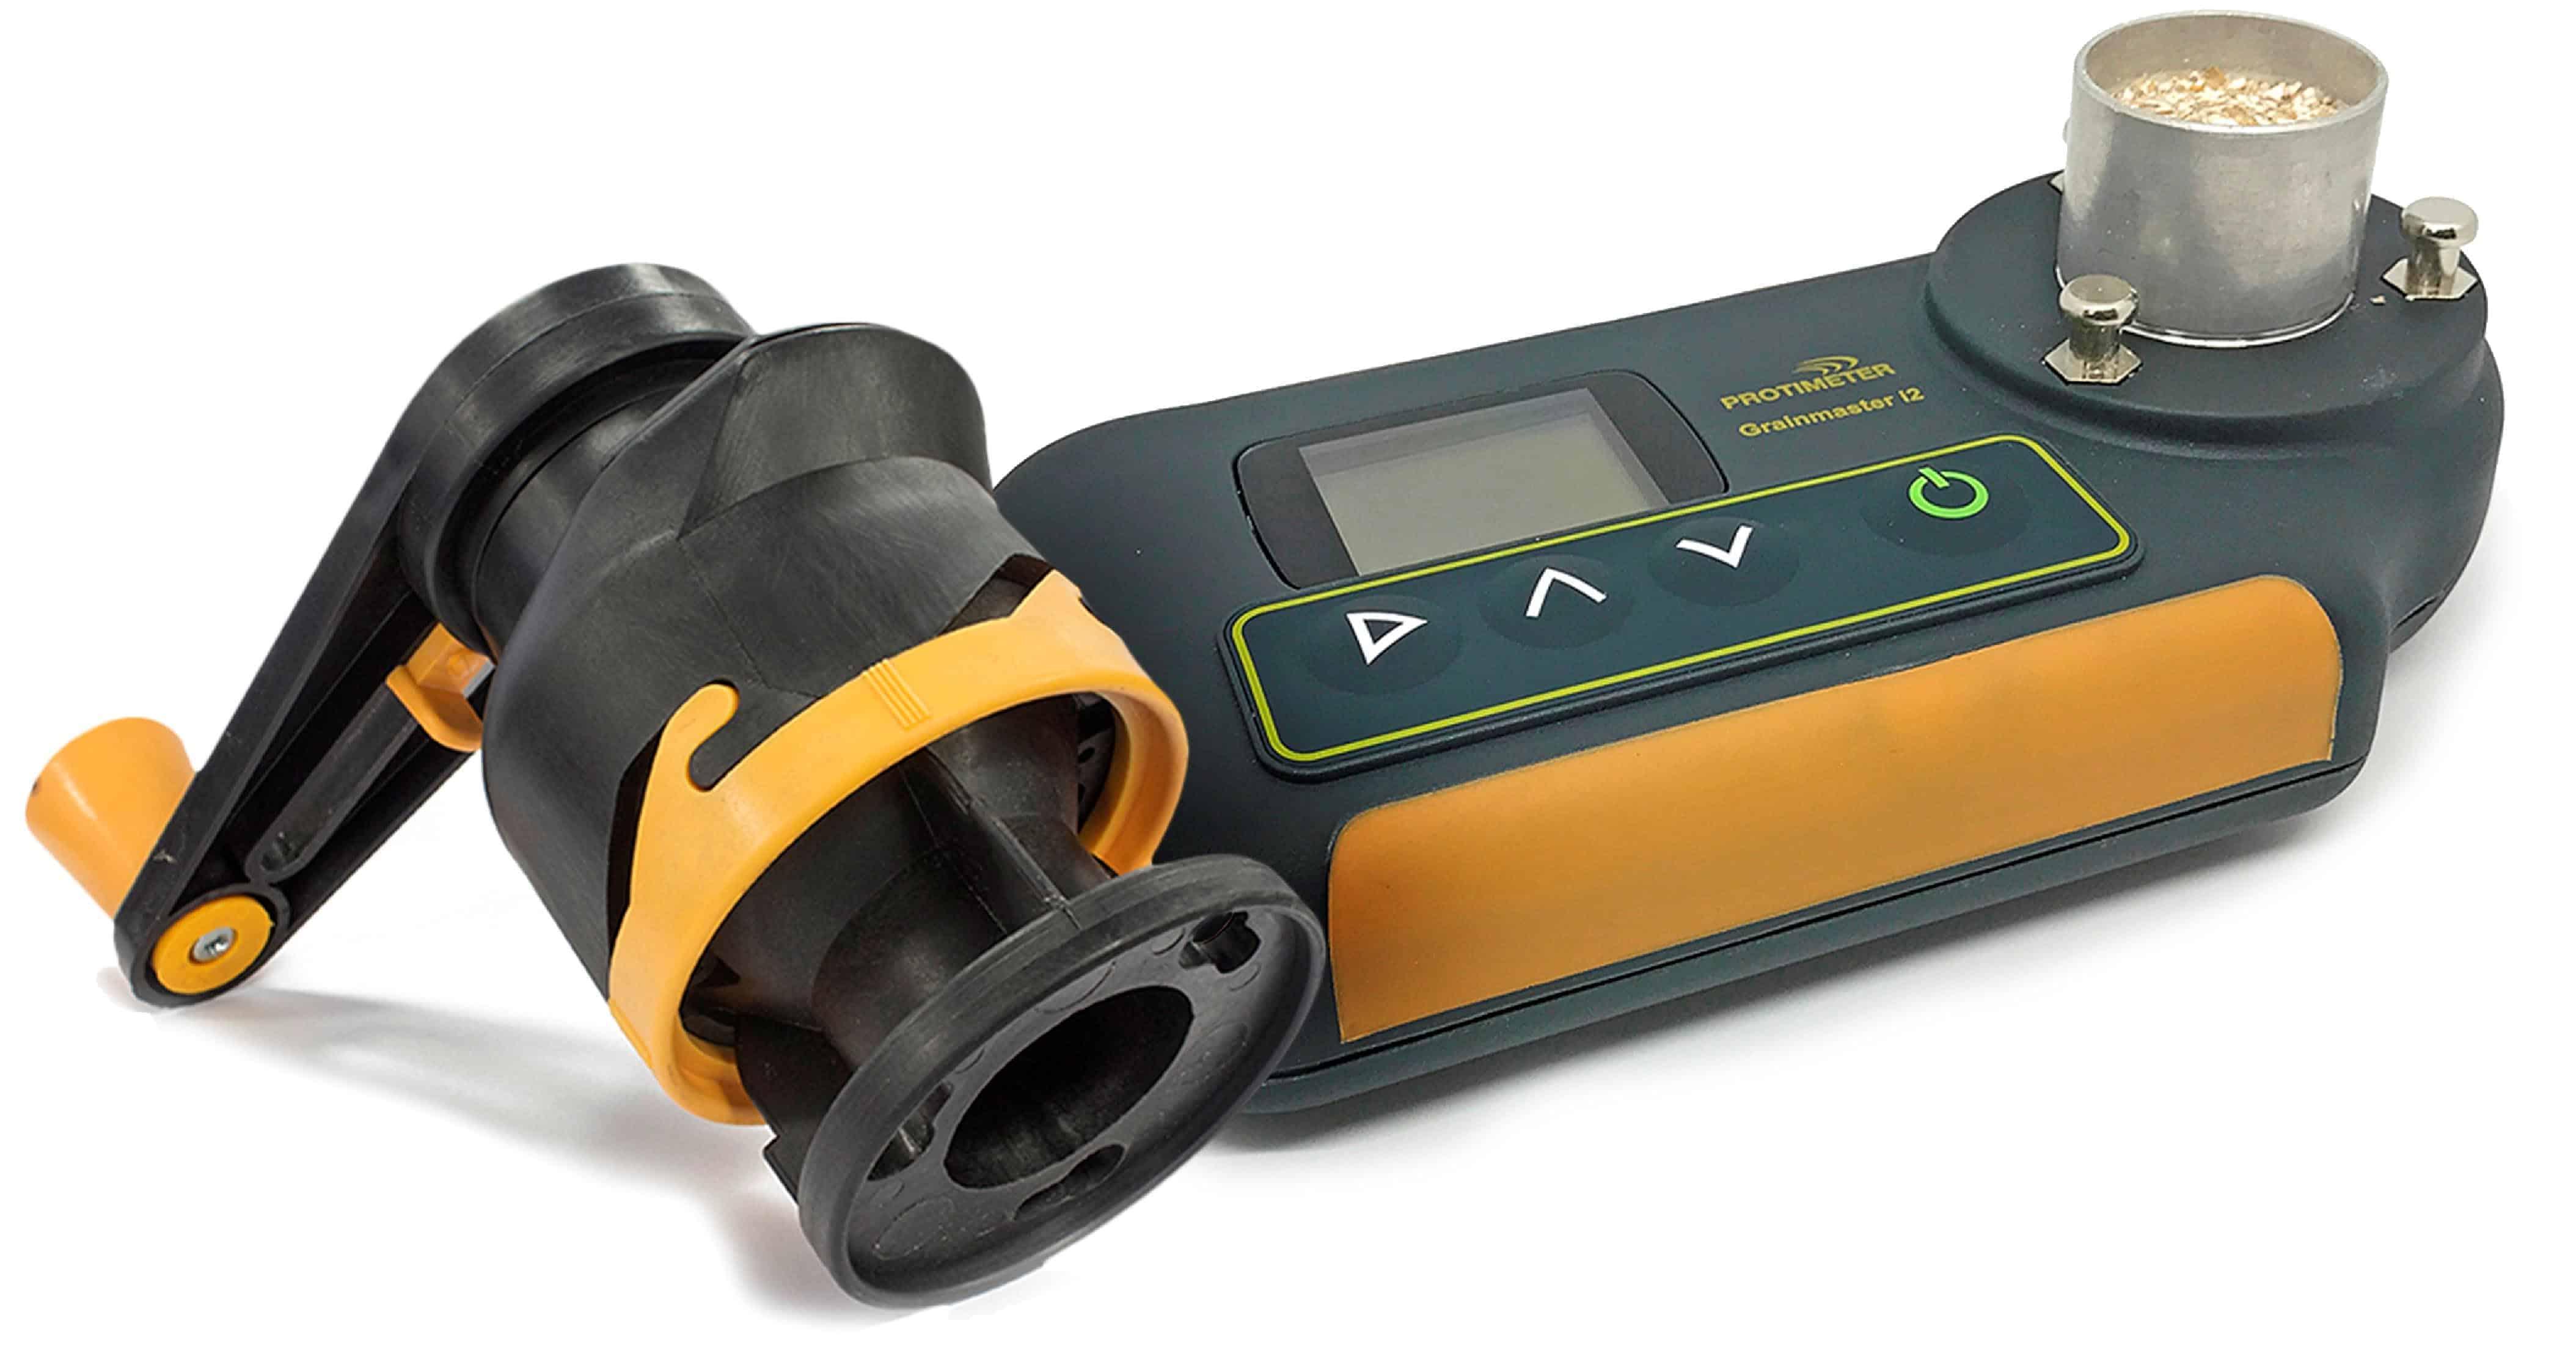 Protimeter grainmaster i2s crop moisture meter with grinder compressor unit